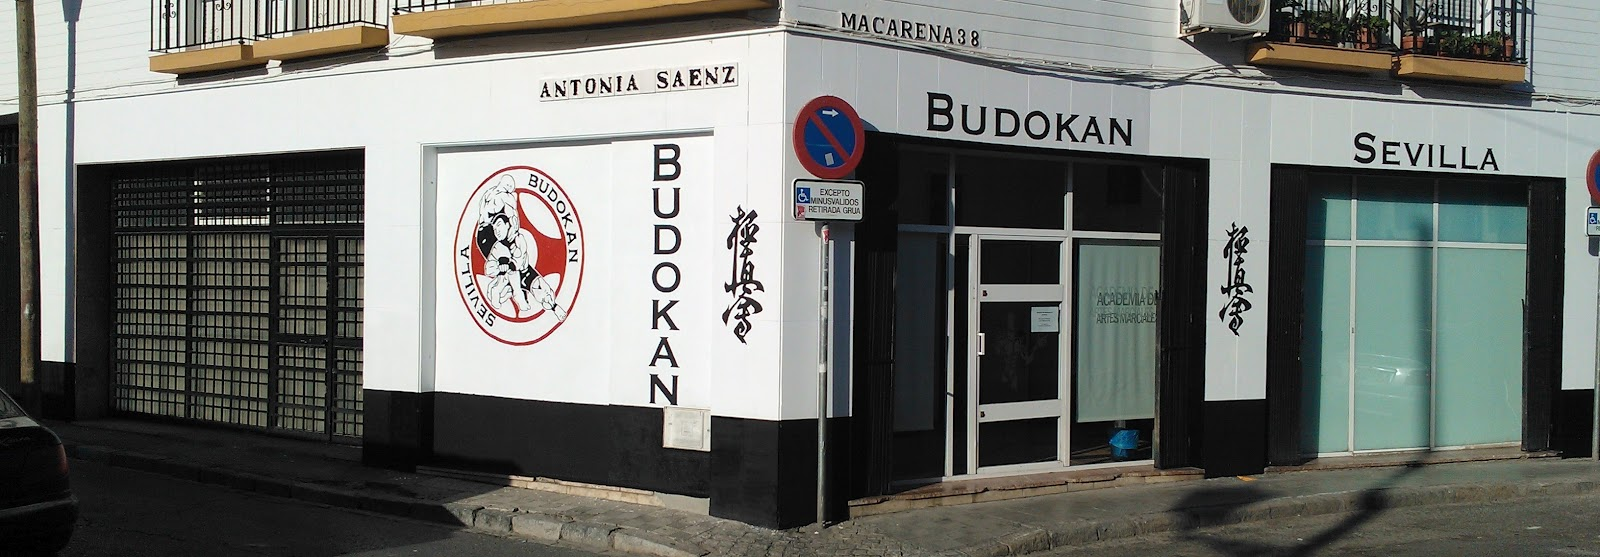 Budokan blog de artes marciales el club budokan sevilla - Artes marciales sevilla ...